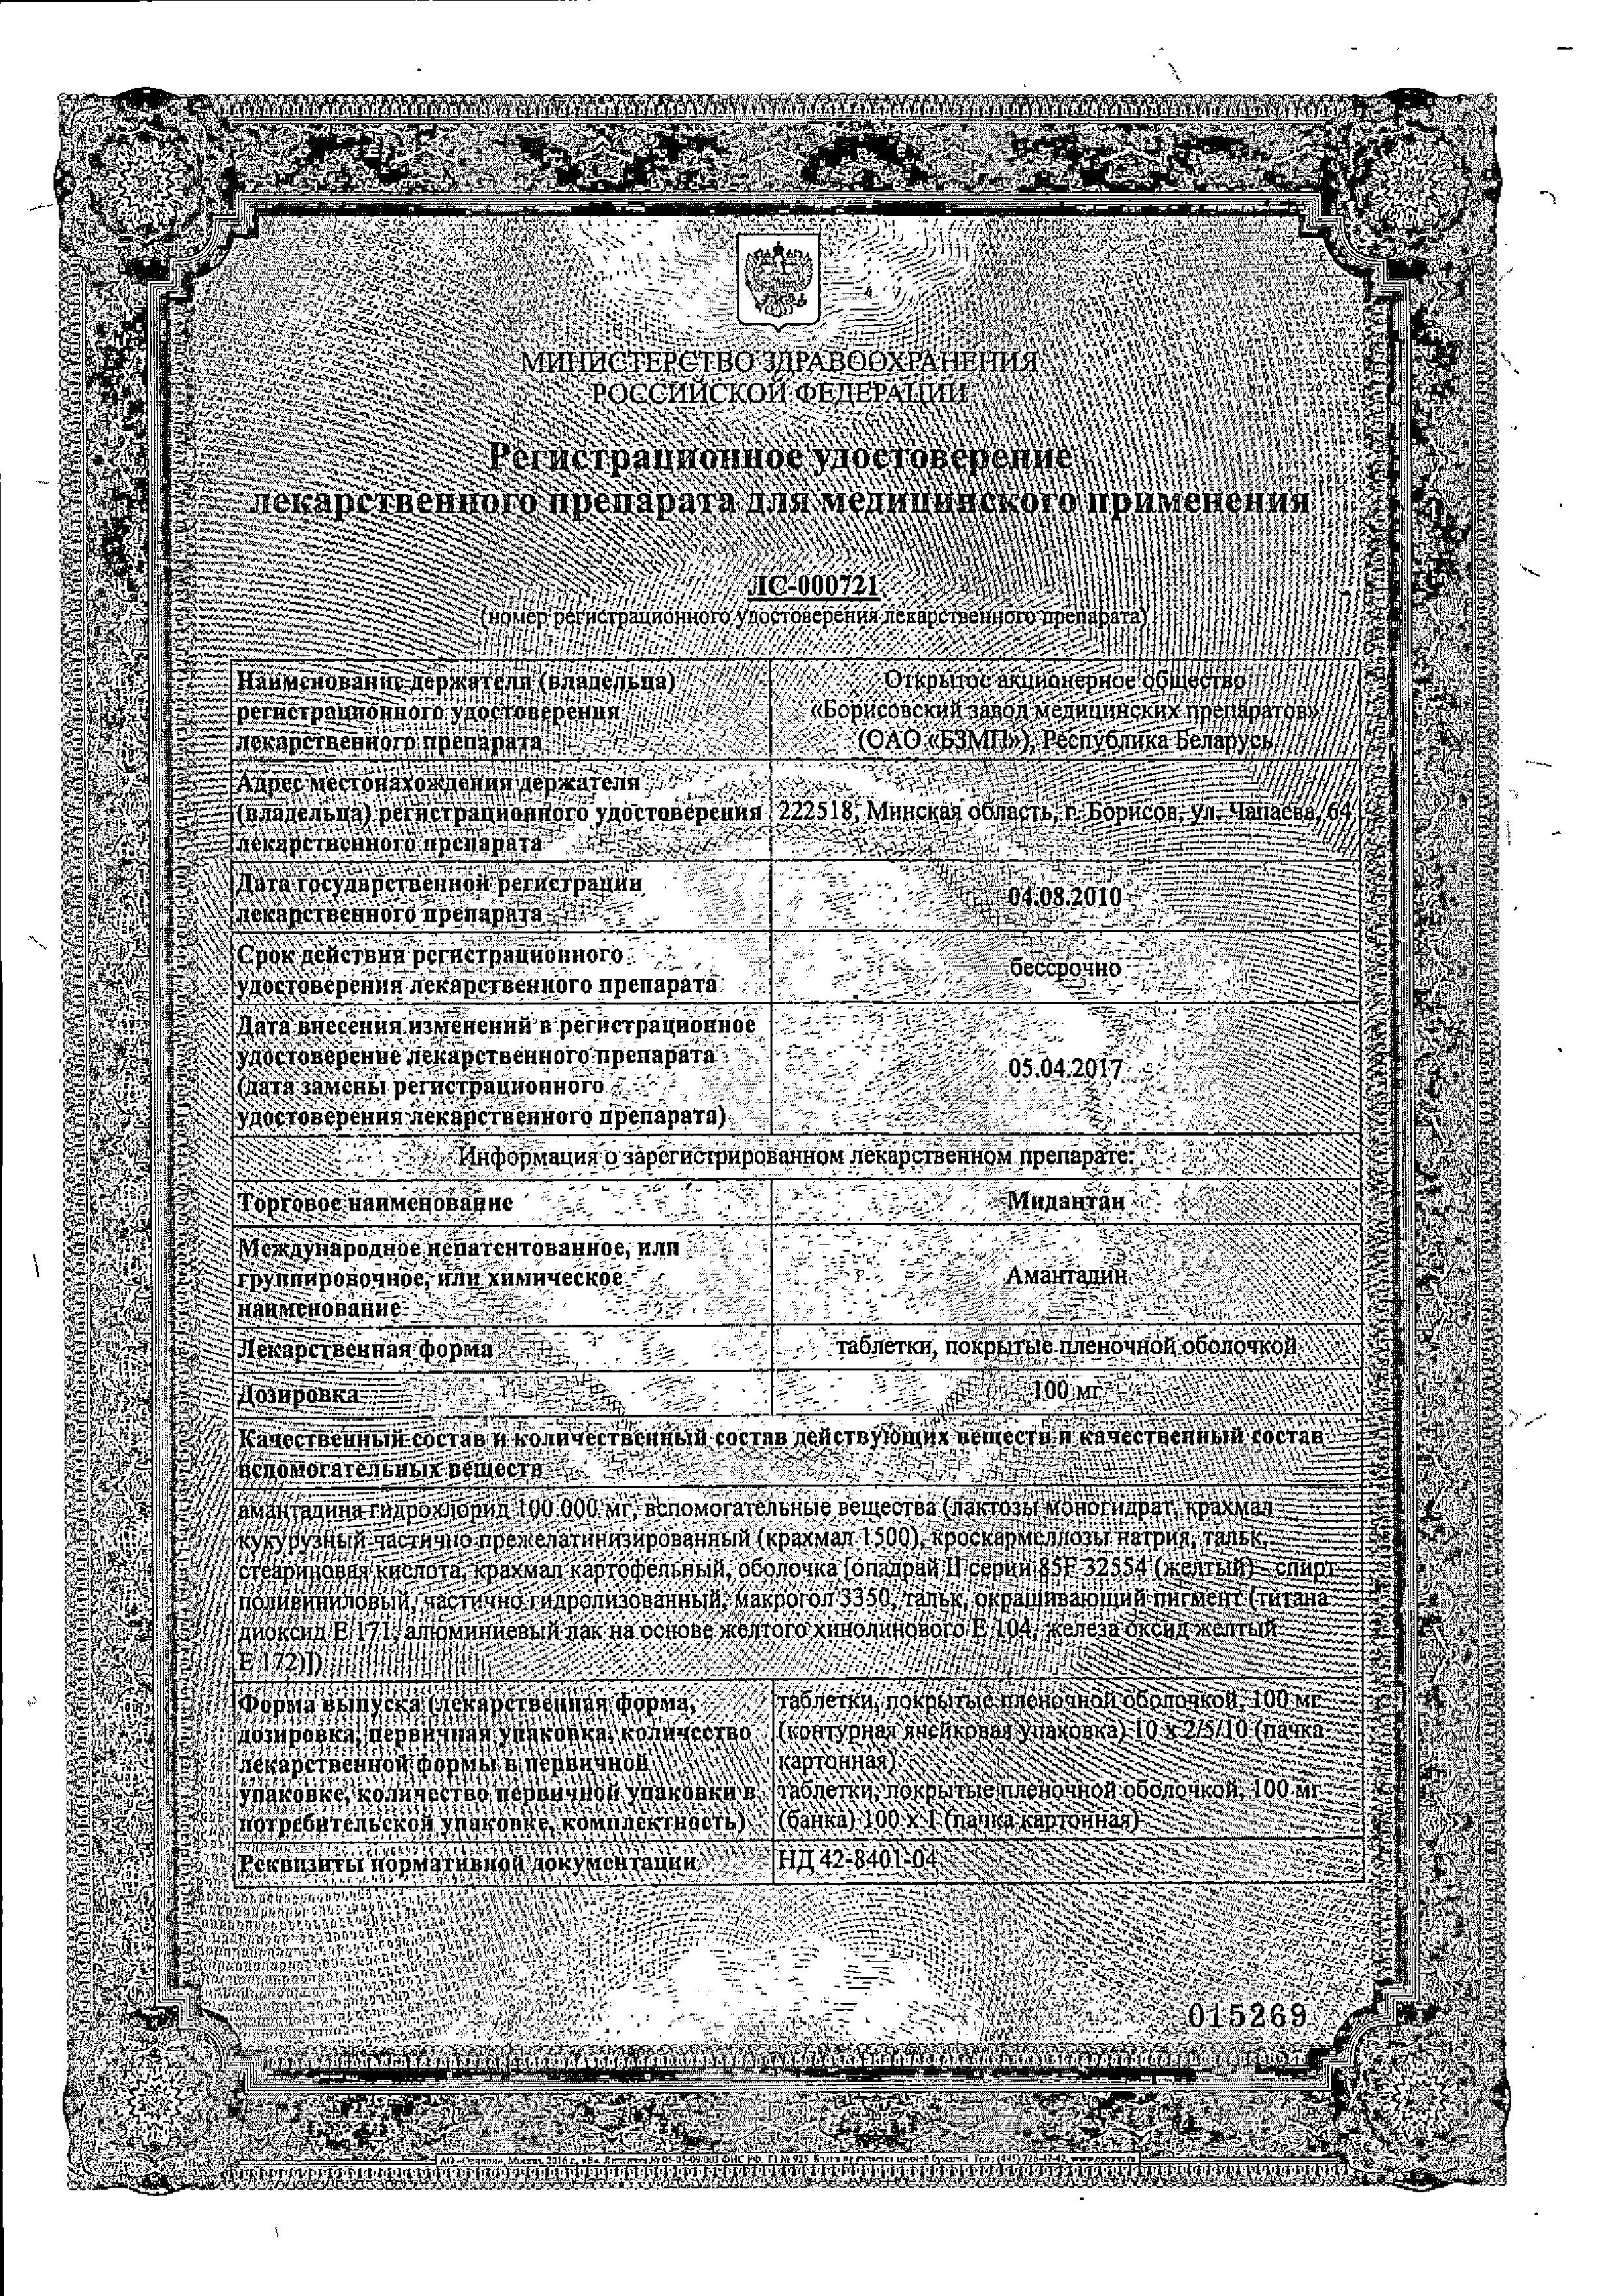 Мидантан сертификат